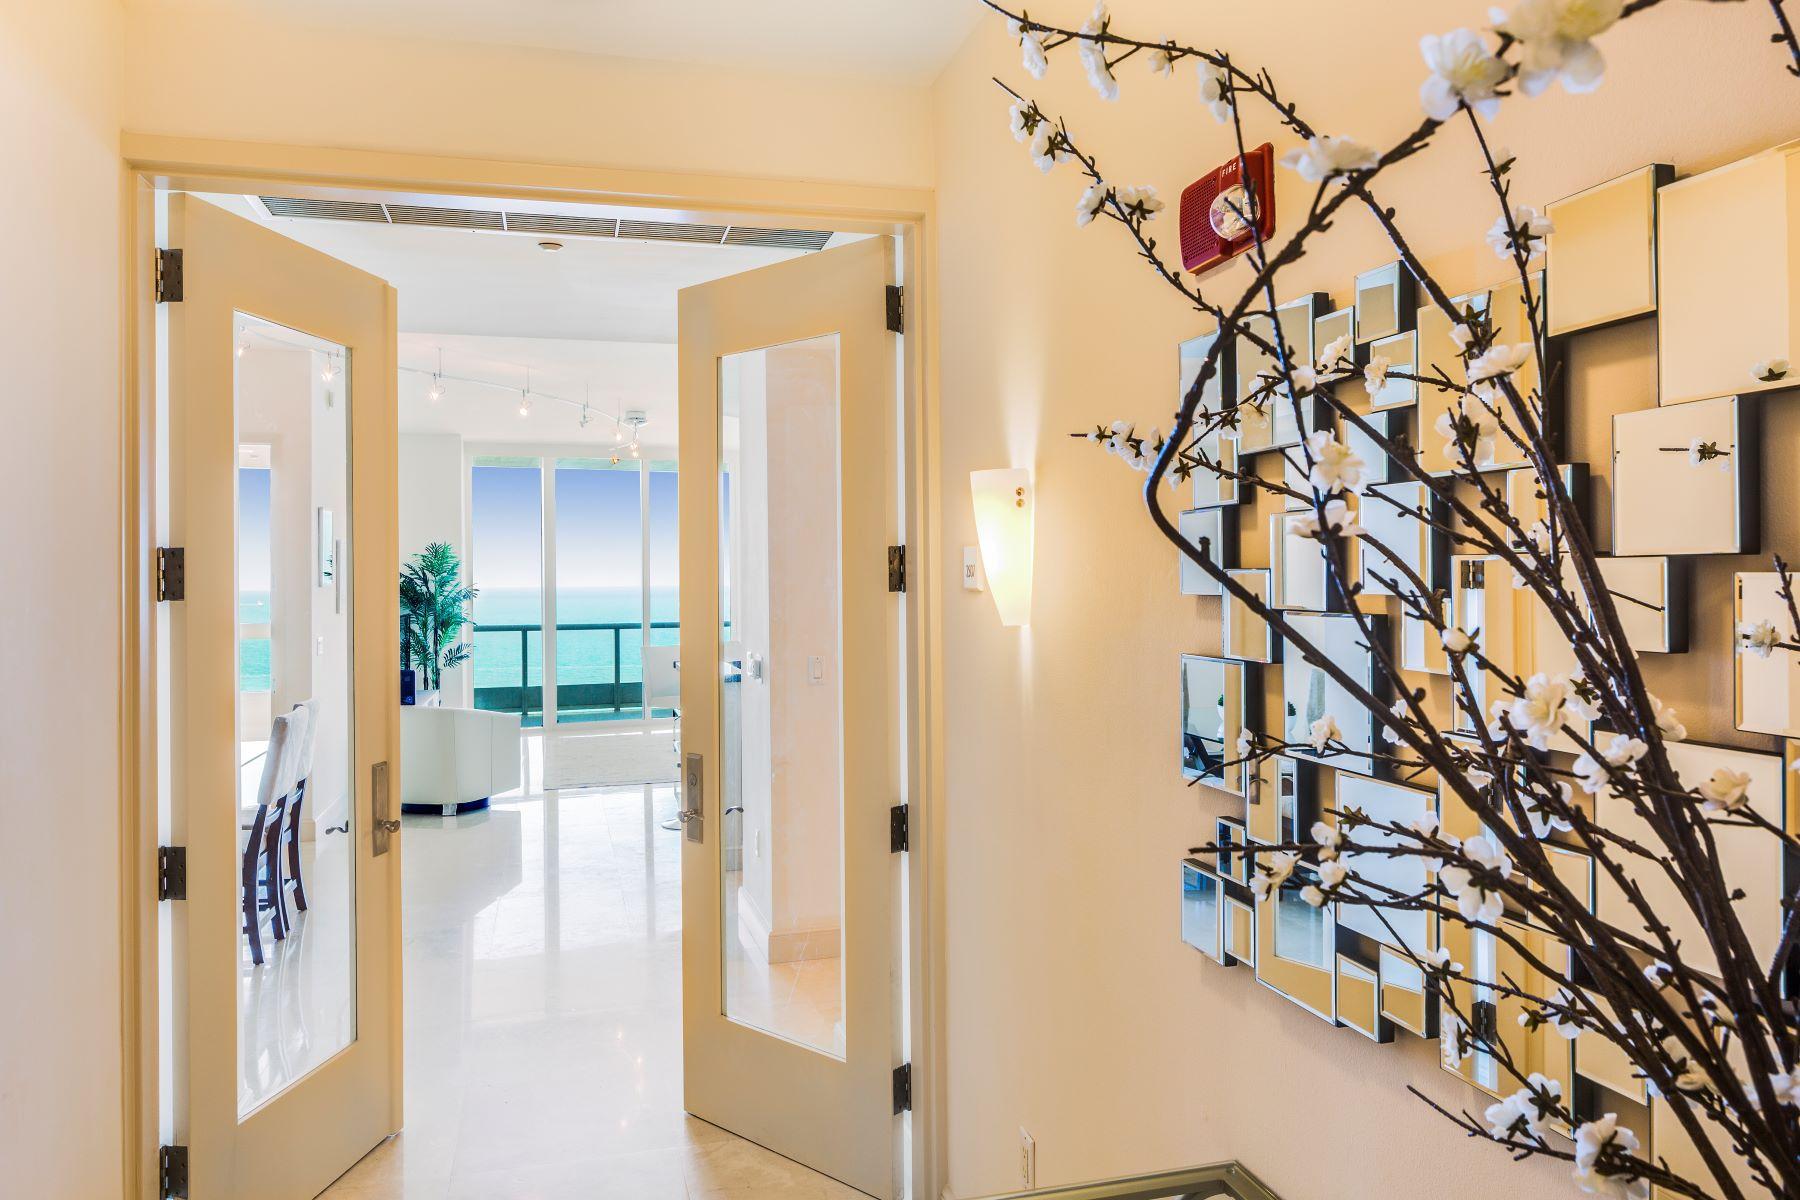 Condominium for Sale at 100 S Pointe Dr 100 S Pointe Dr 2507, Miami Beach, Florida, 33139 United States